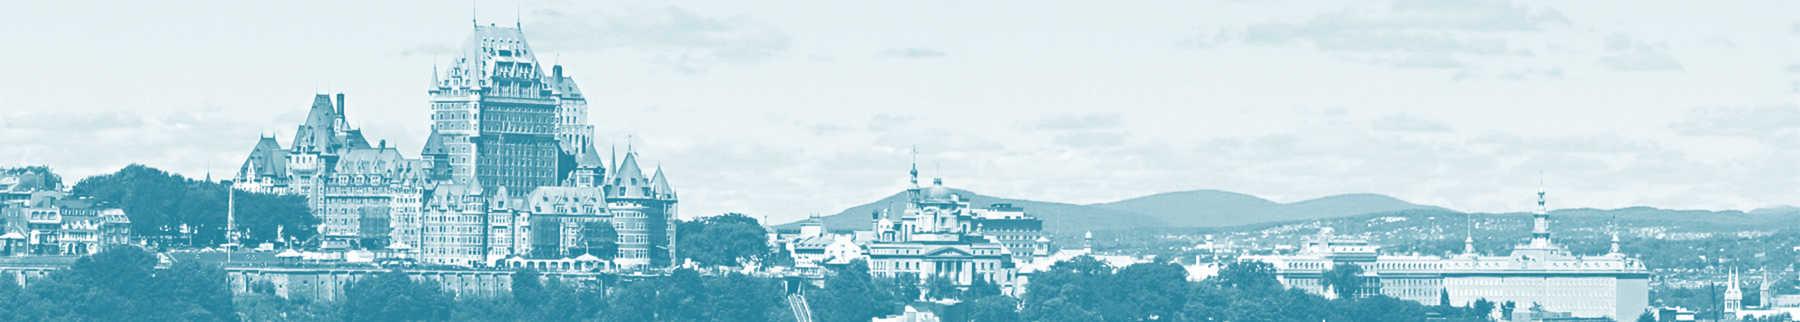 Panorama-QC